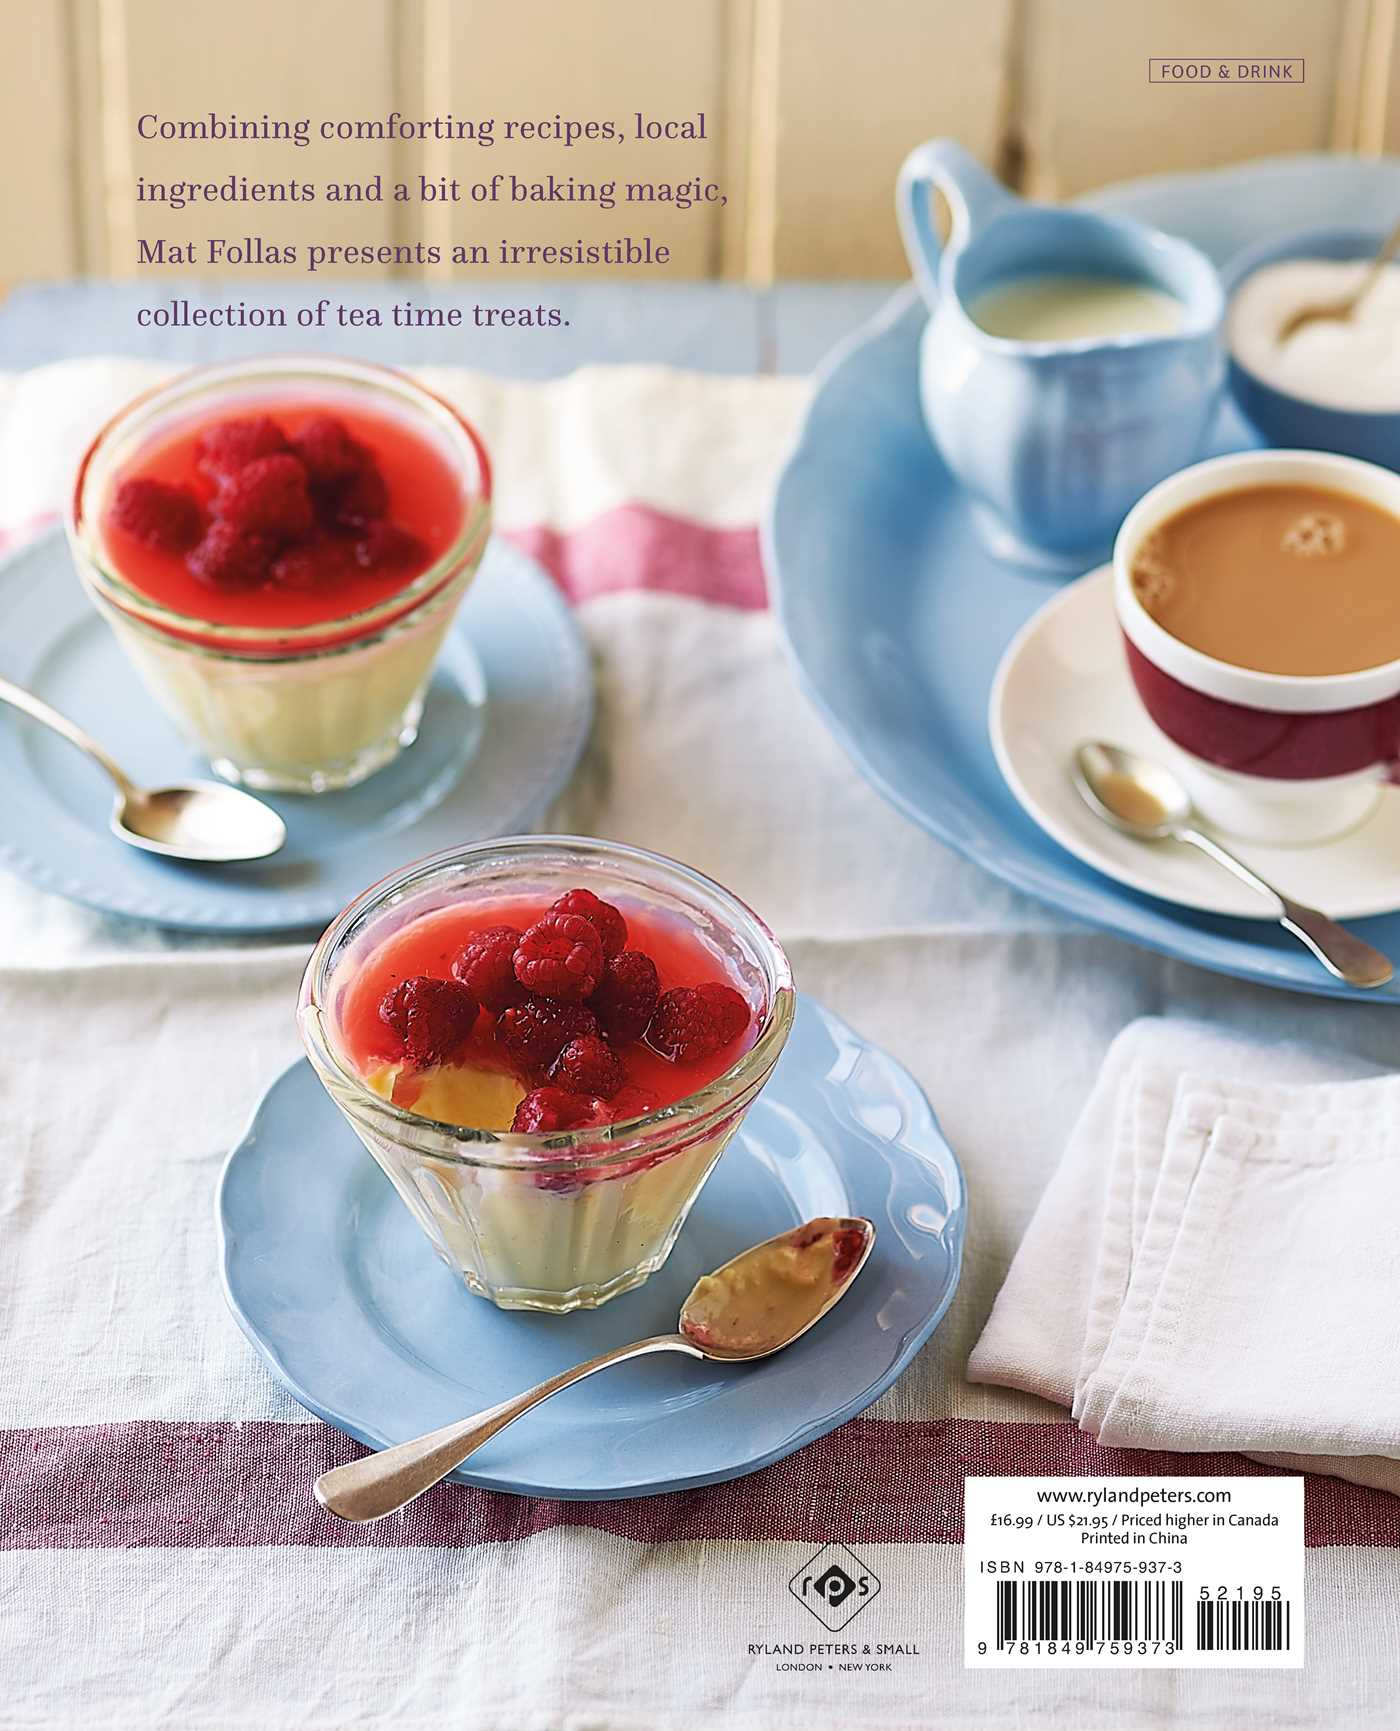 Afternoon tea at bramble cafe 9781849759373 hr back